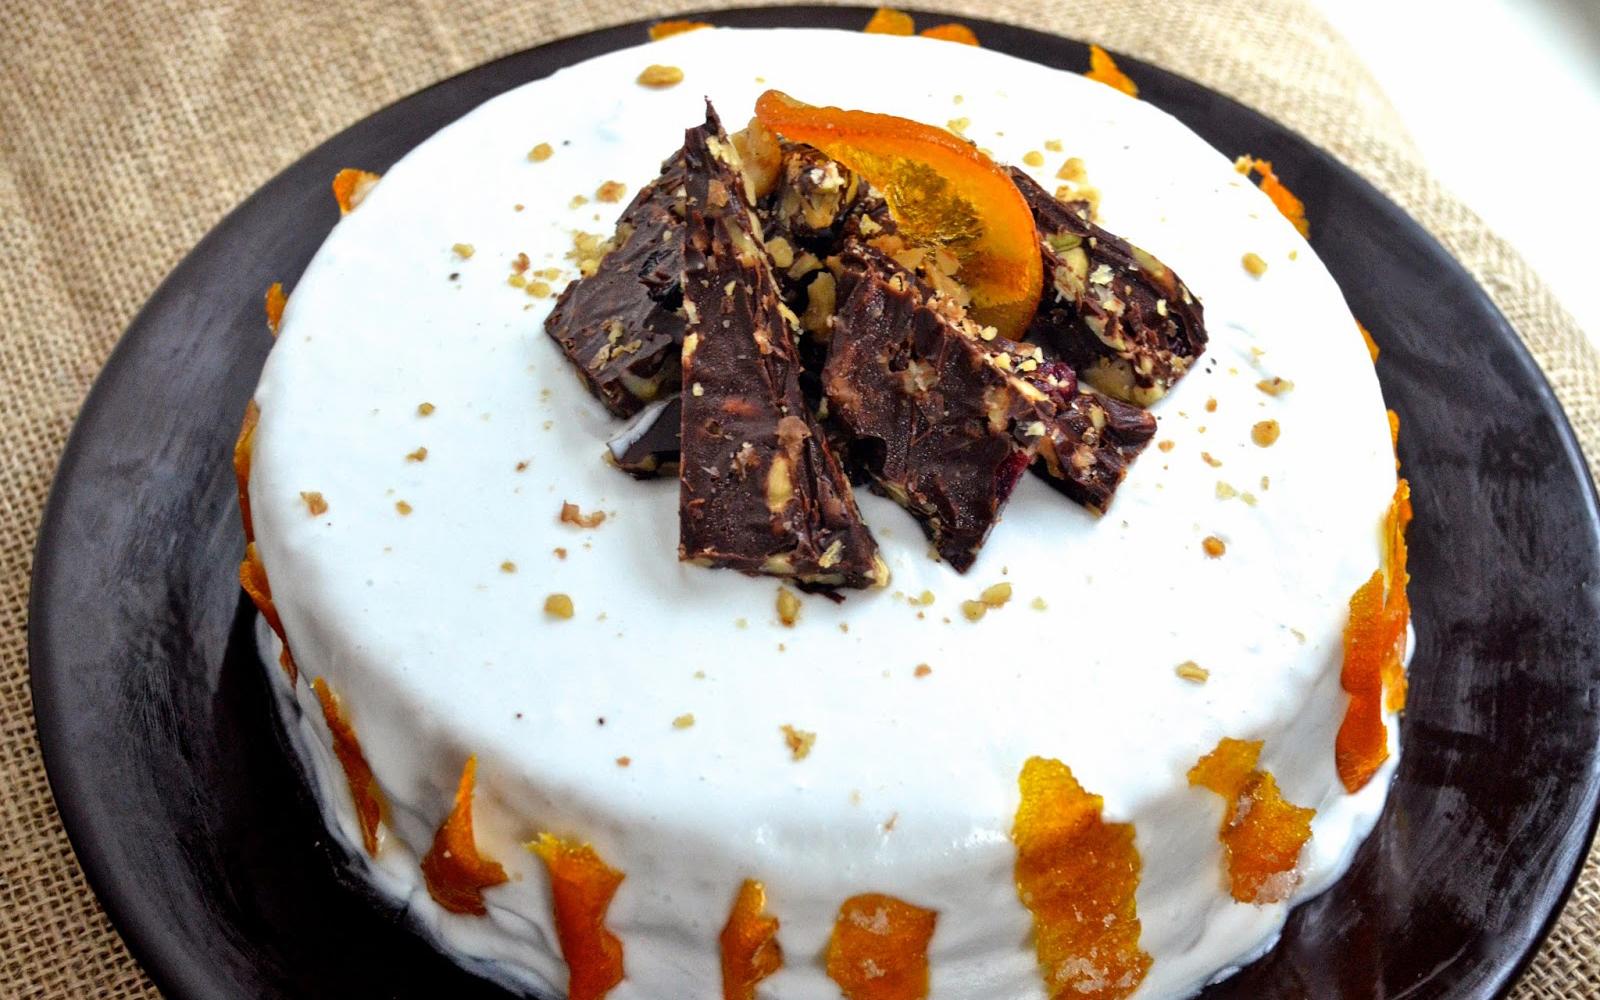 Orange Creamsicle Cake With Candied Orange Peel [Vegan]